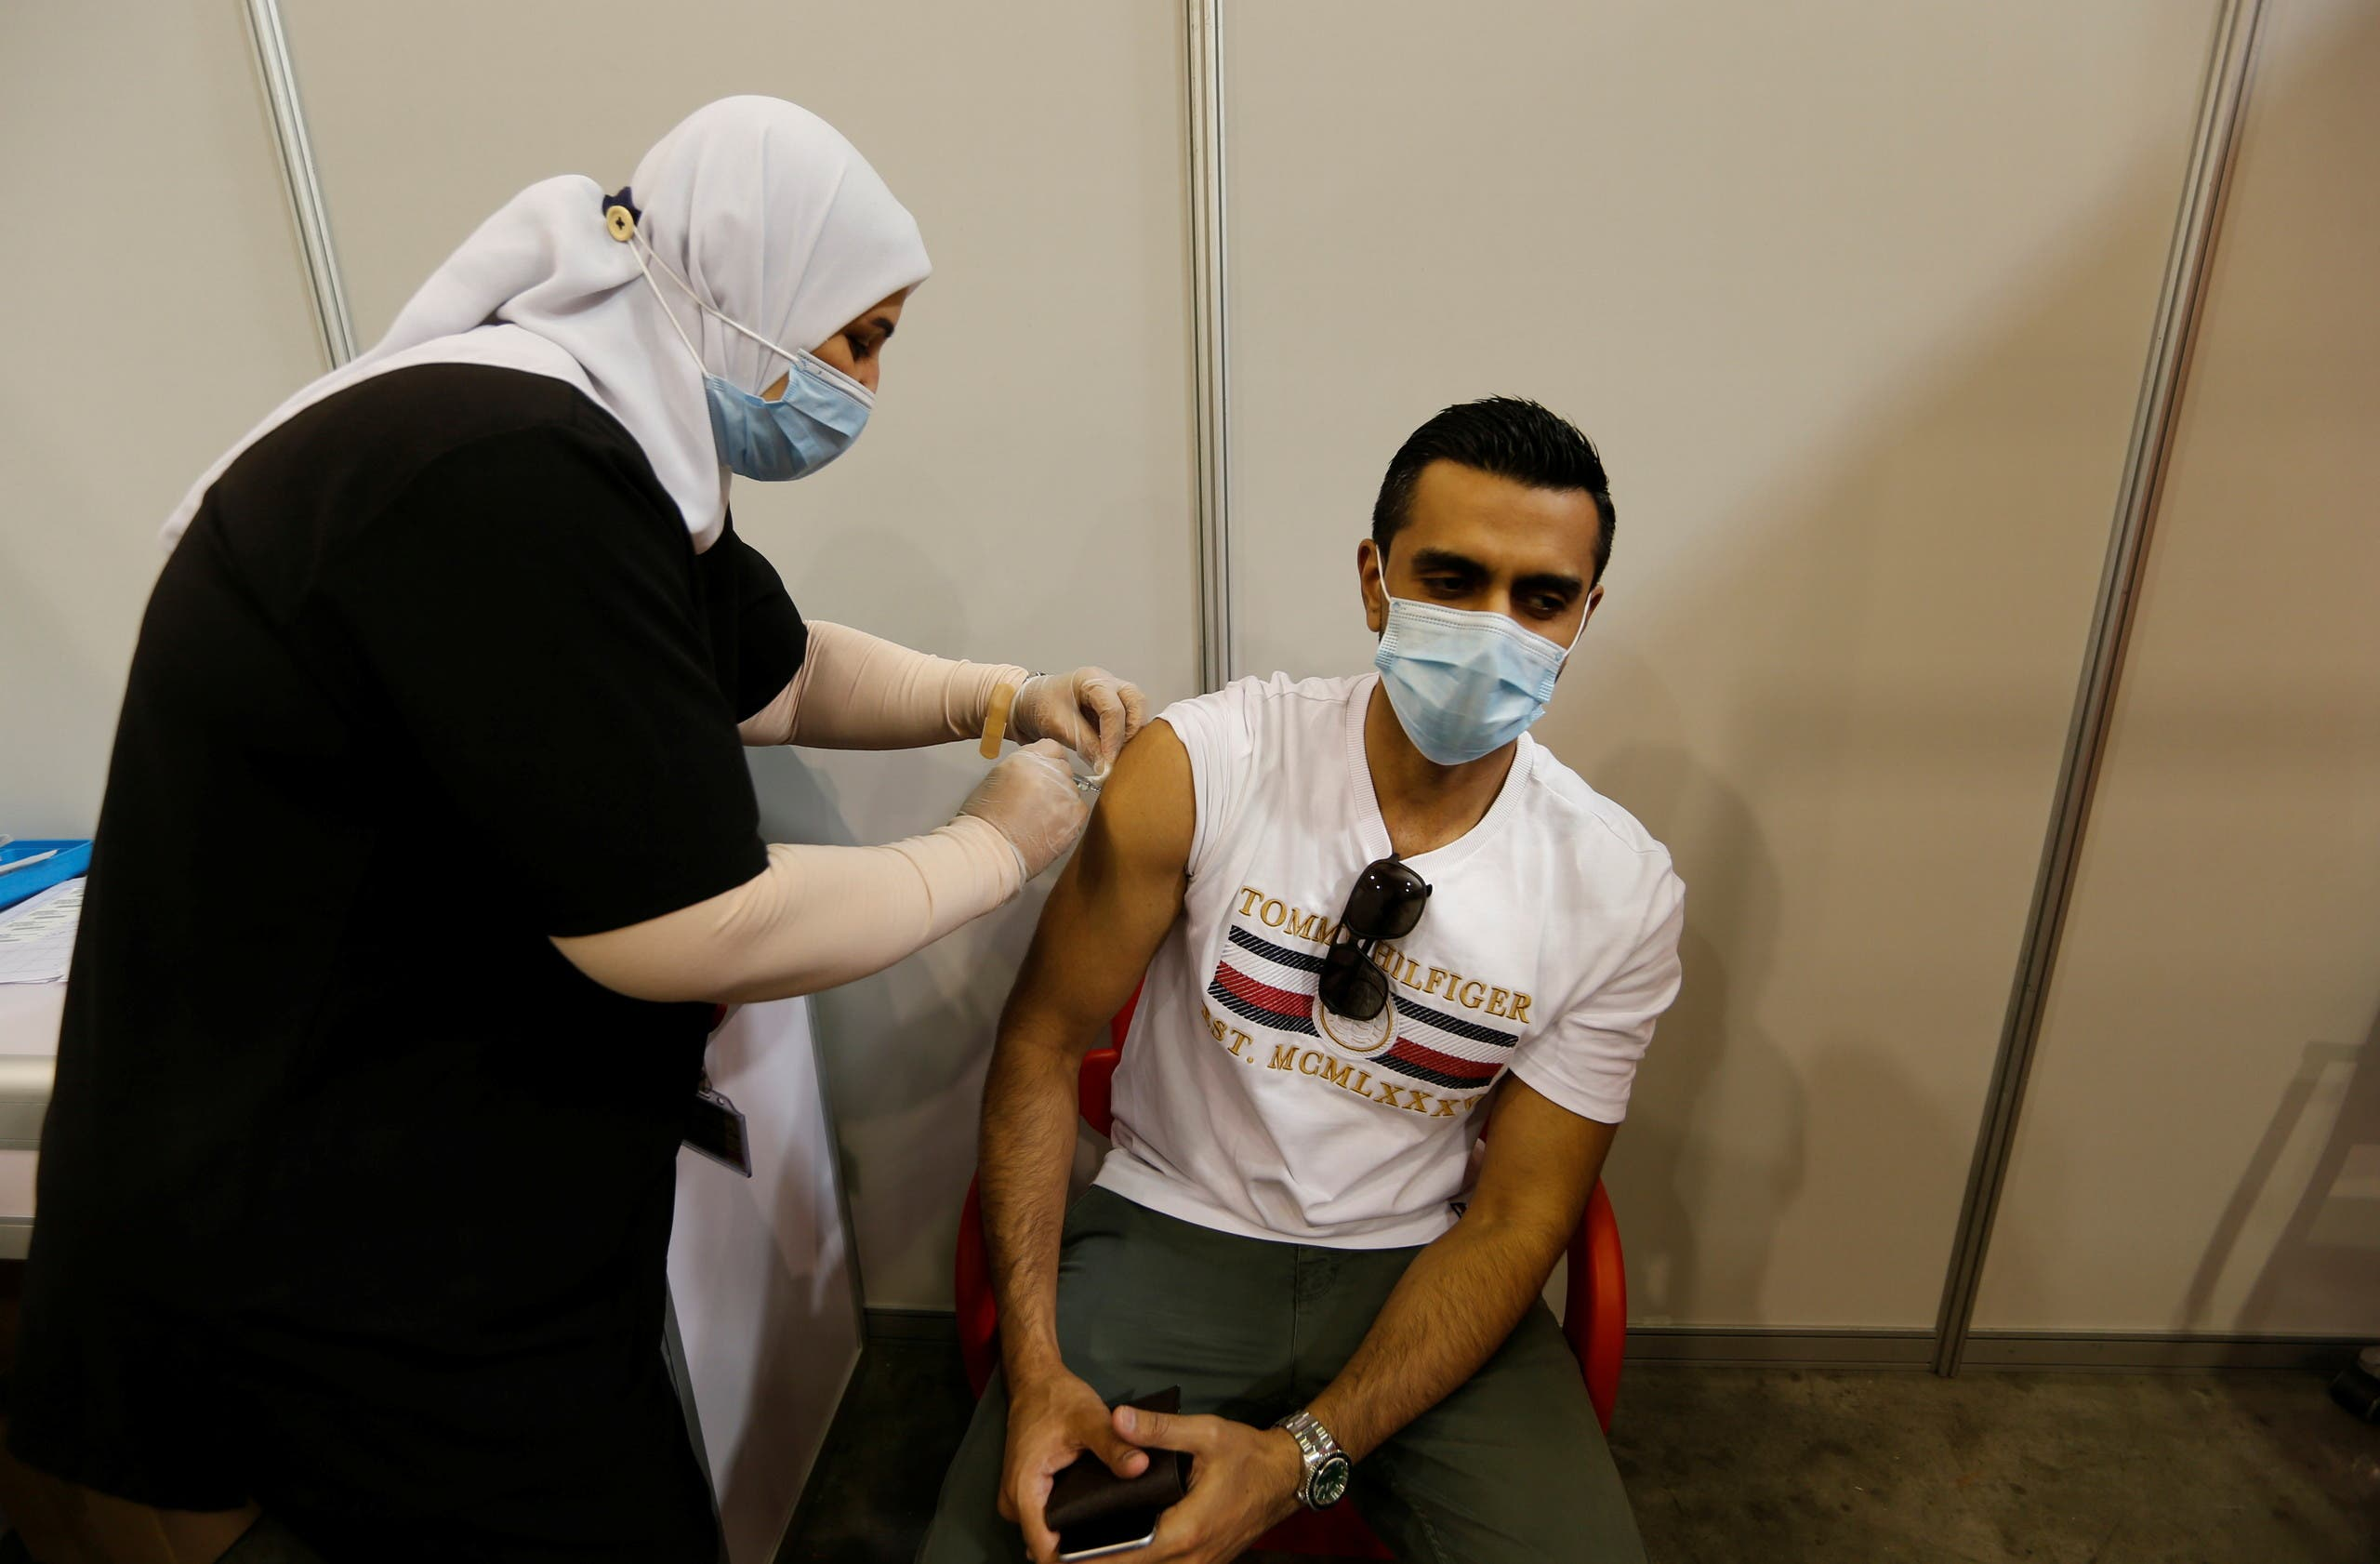 A Bahraini man gets a dose of a coronavirus disease (COVID-19) vaccine, at Bahrain International Exhibition & Convention Centre (BIECC), in Manama. (Reuters)